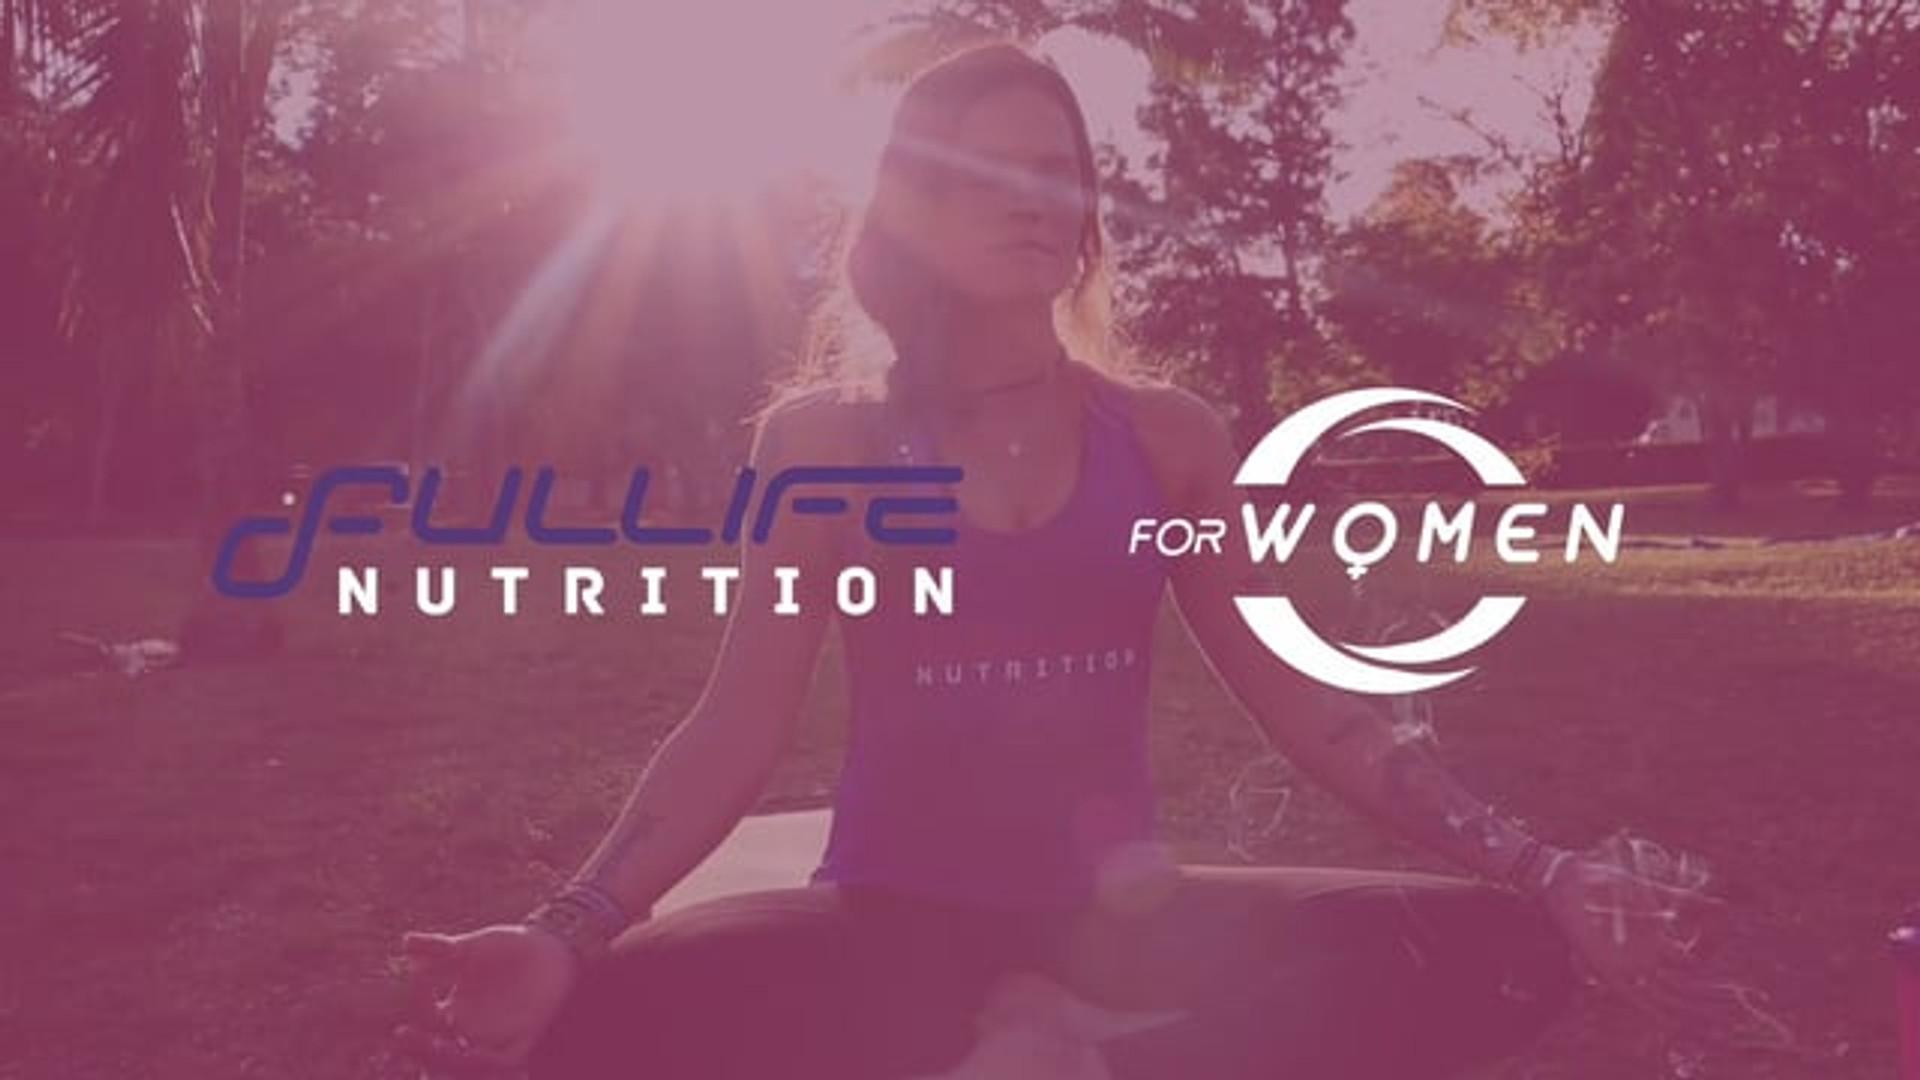 Fullife Nutrition VT LINHA WOMAN